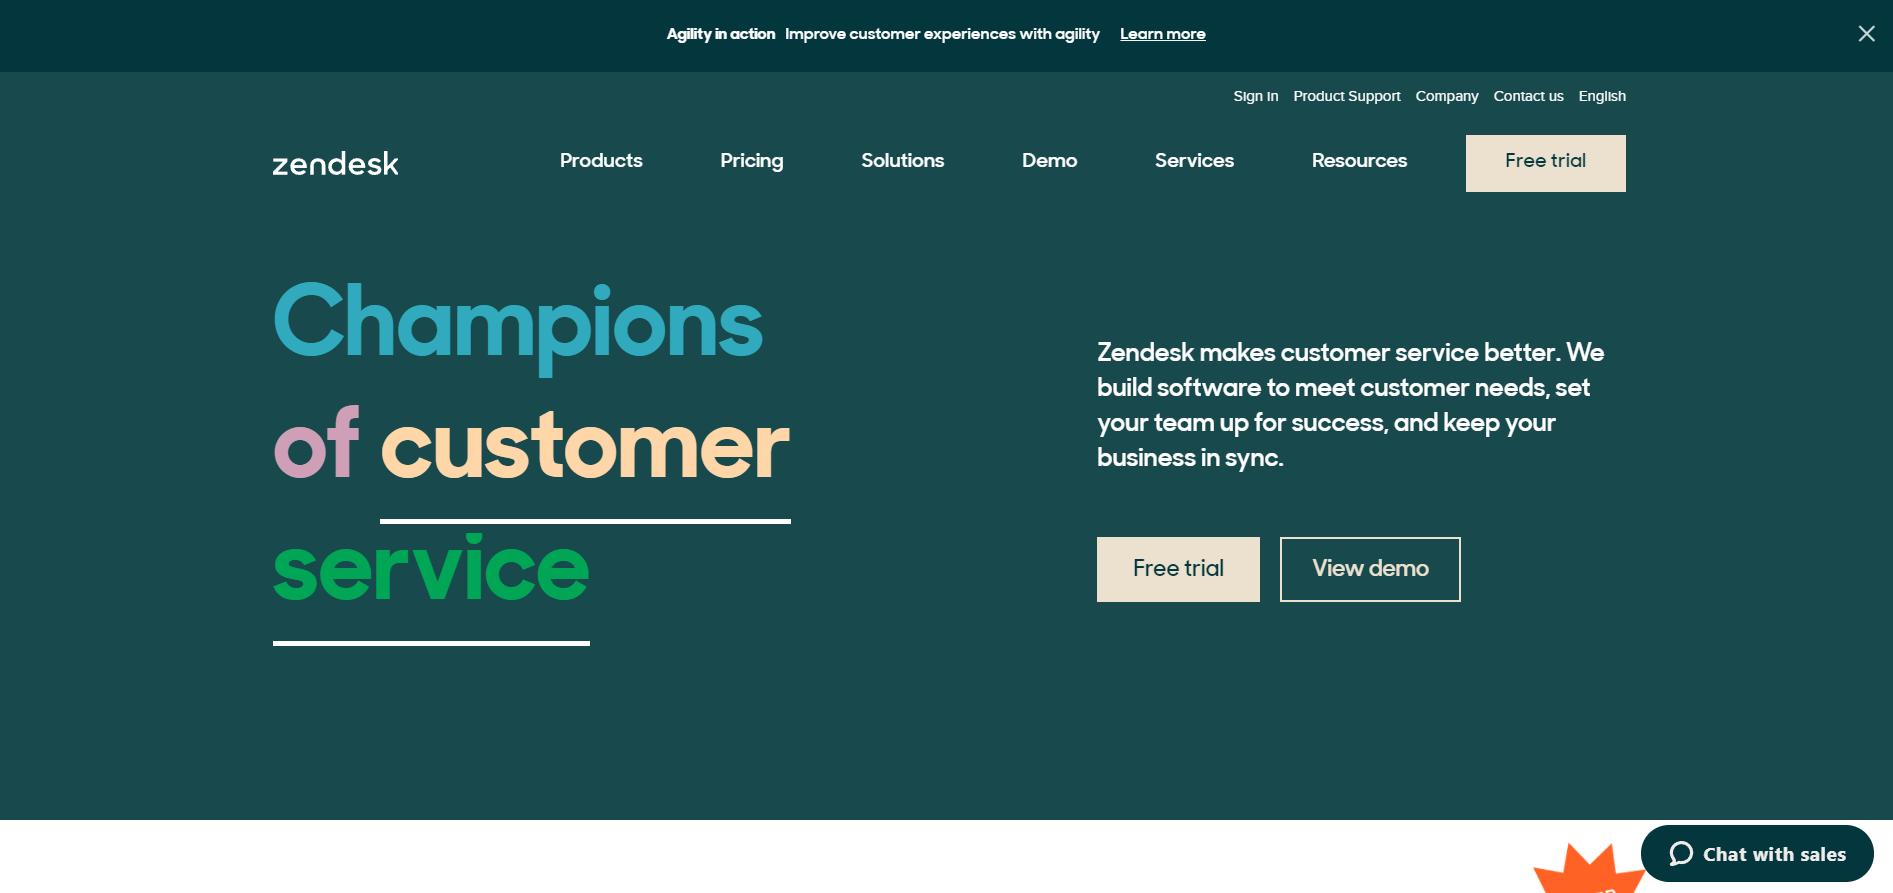 Zendesk Customer experience management tool